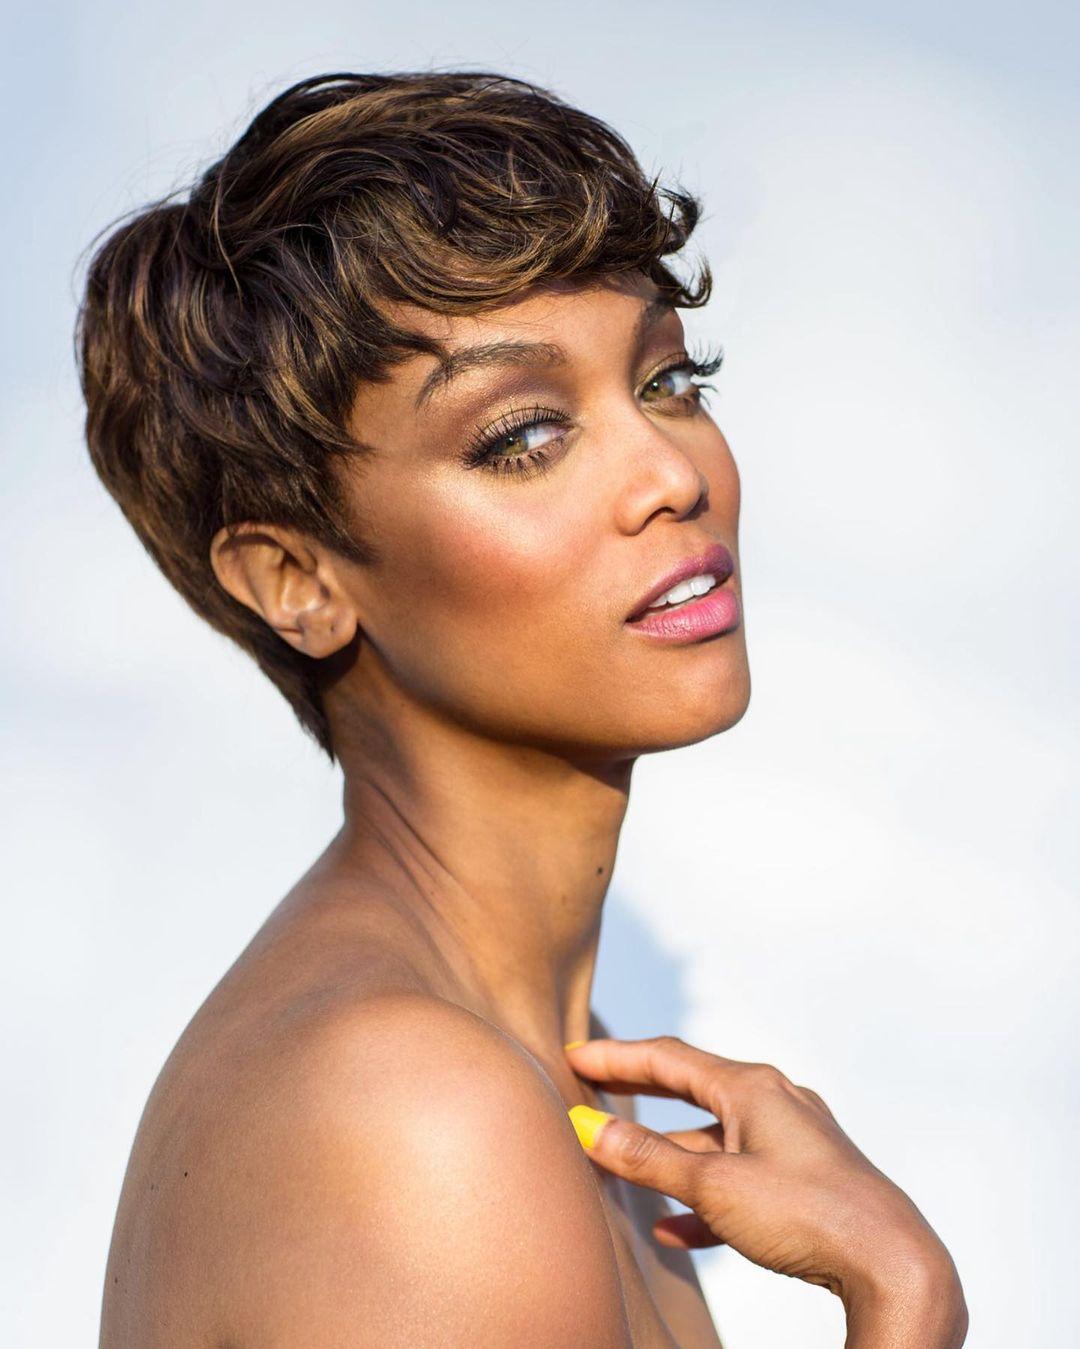 Tyra Banks Two-Minute Makeup Tutorial ...